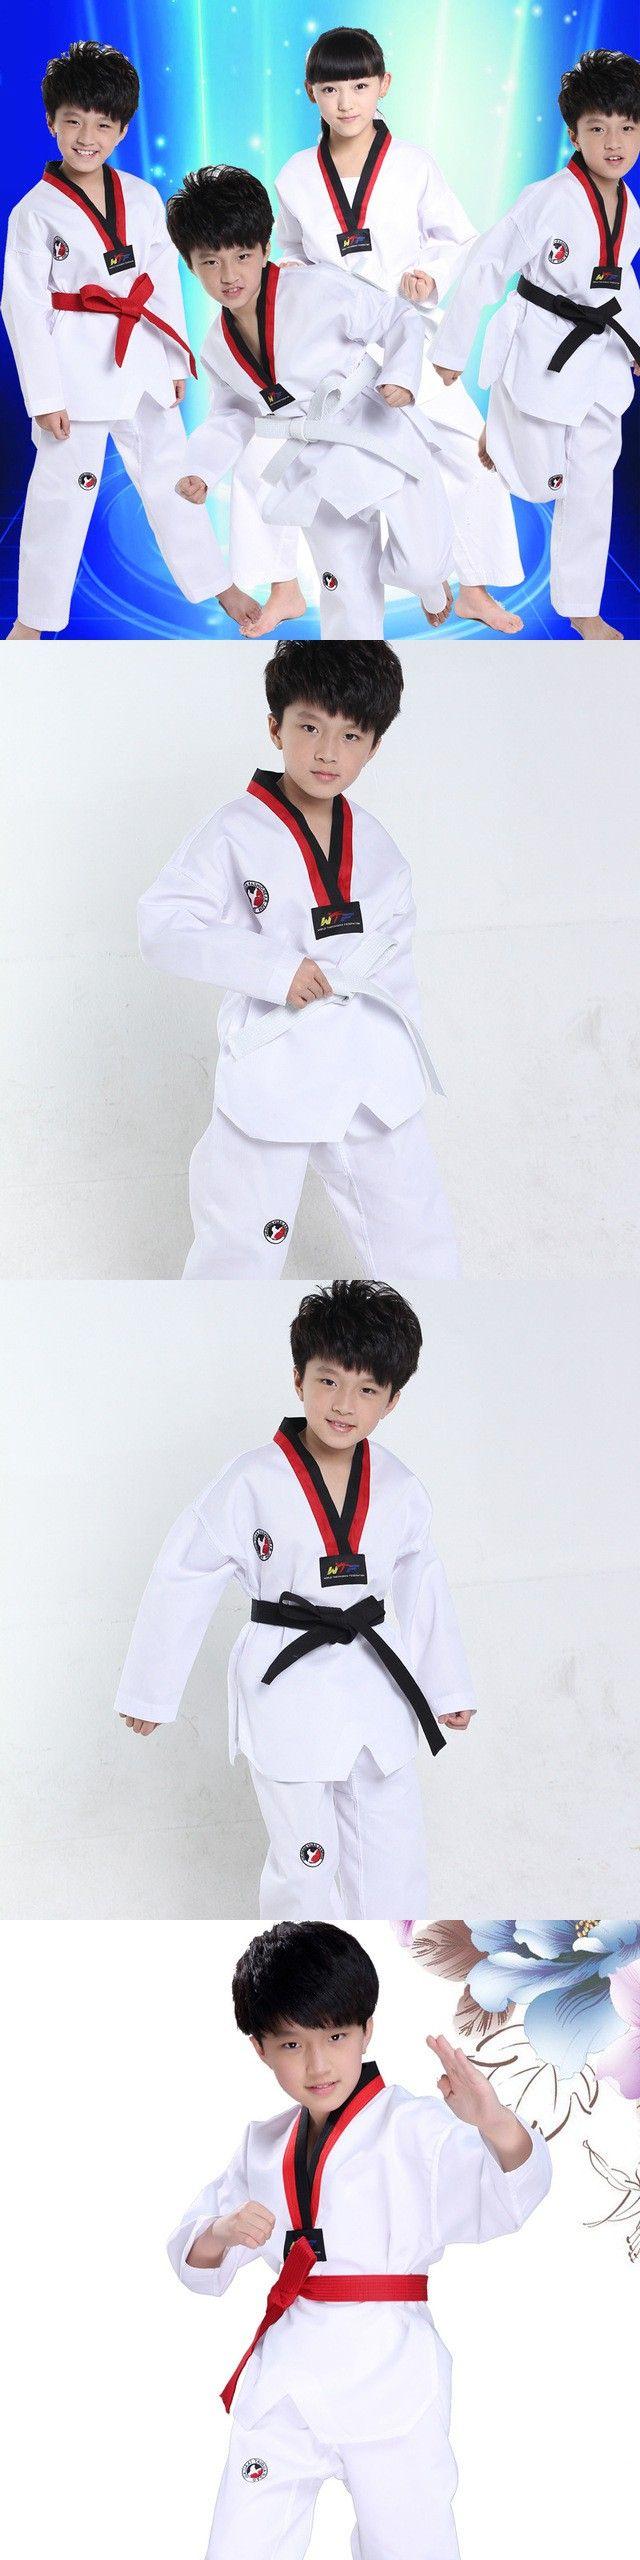 White Long Sleeves Kids Judo Kimono Clothes Children Karate Competition Performance Costumes Boys Girls Taekwondo Suits $21.25